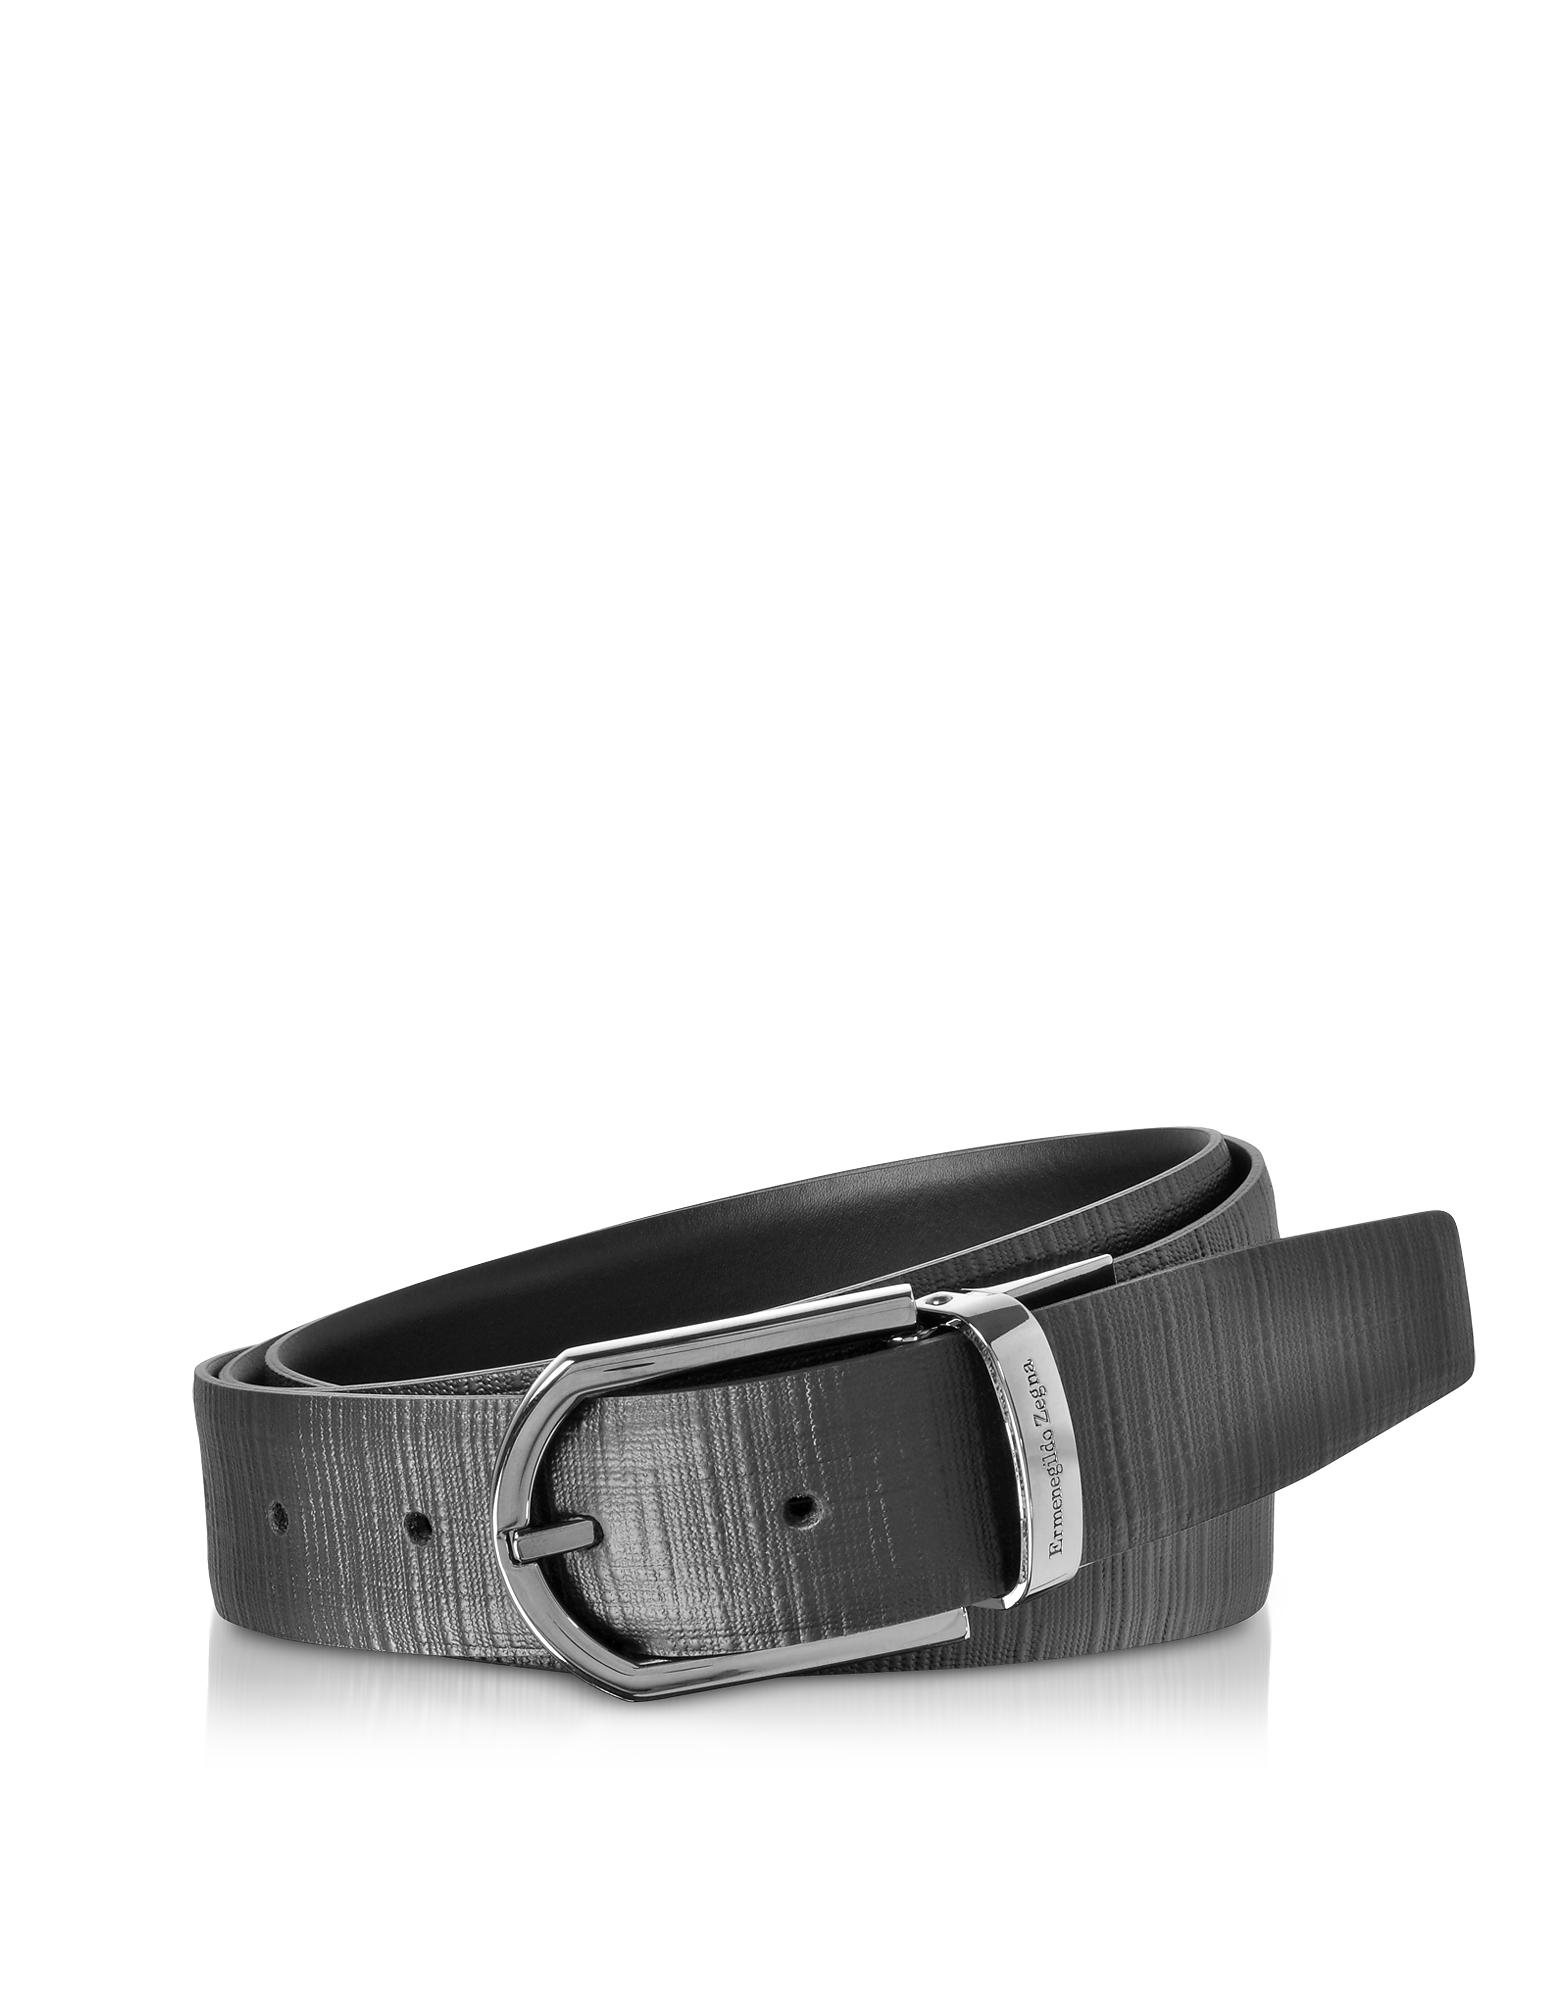 Black Embossed Leather Adjustable and Reversible Men's Belt